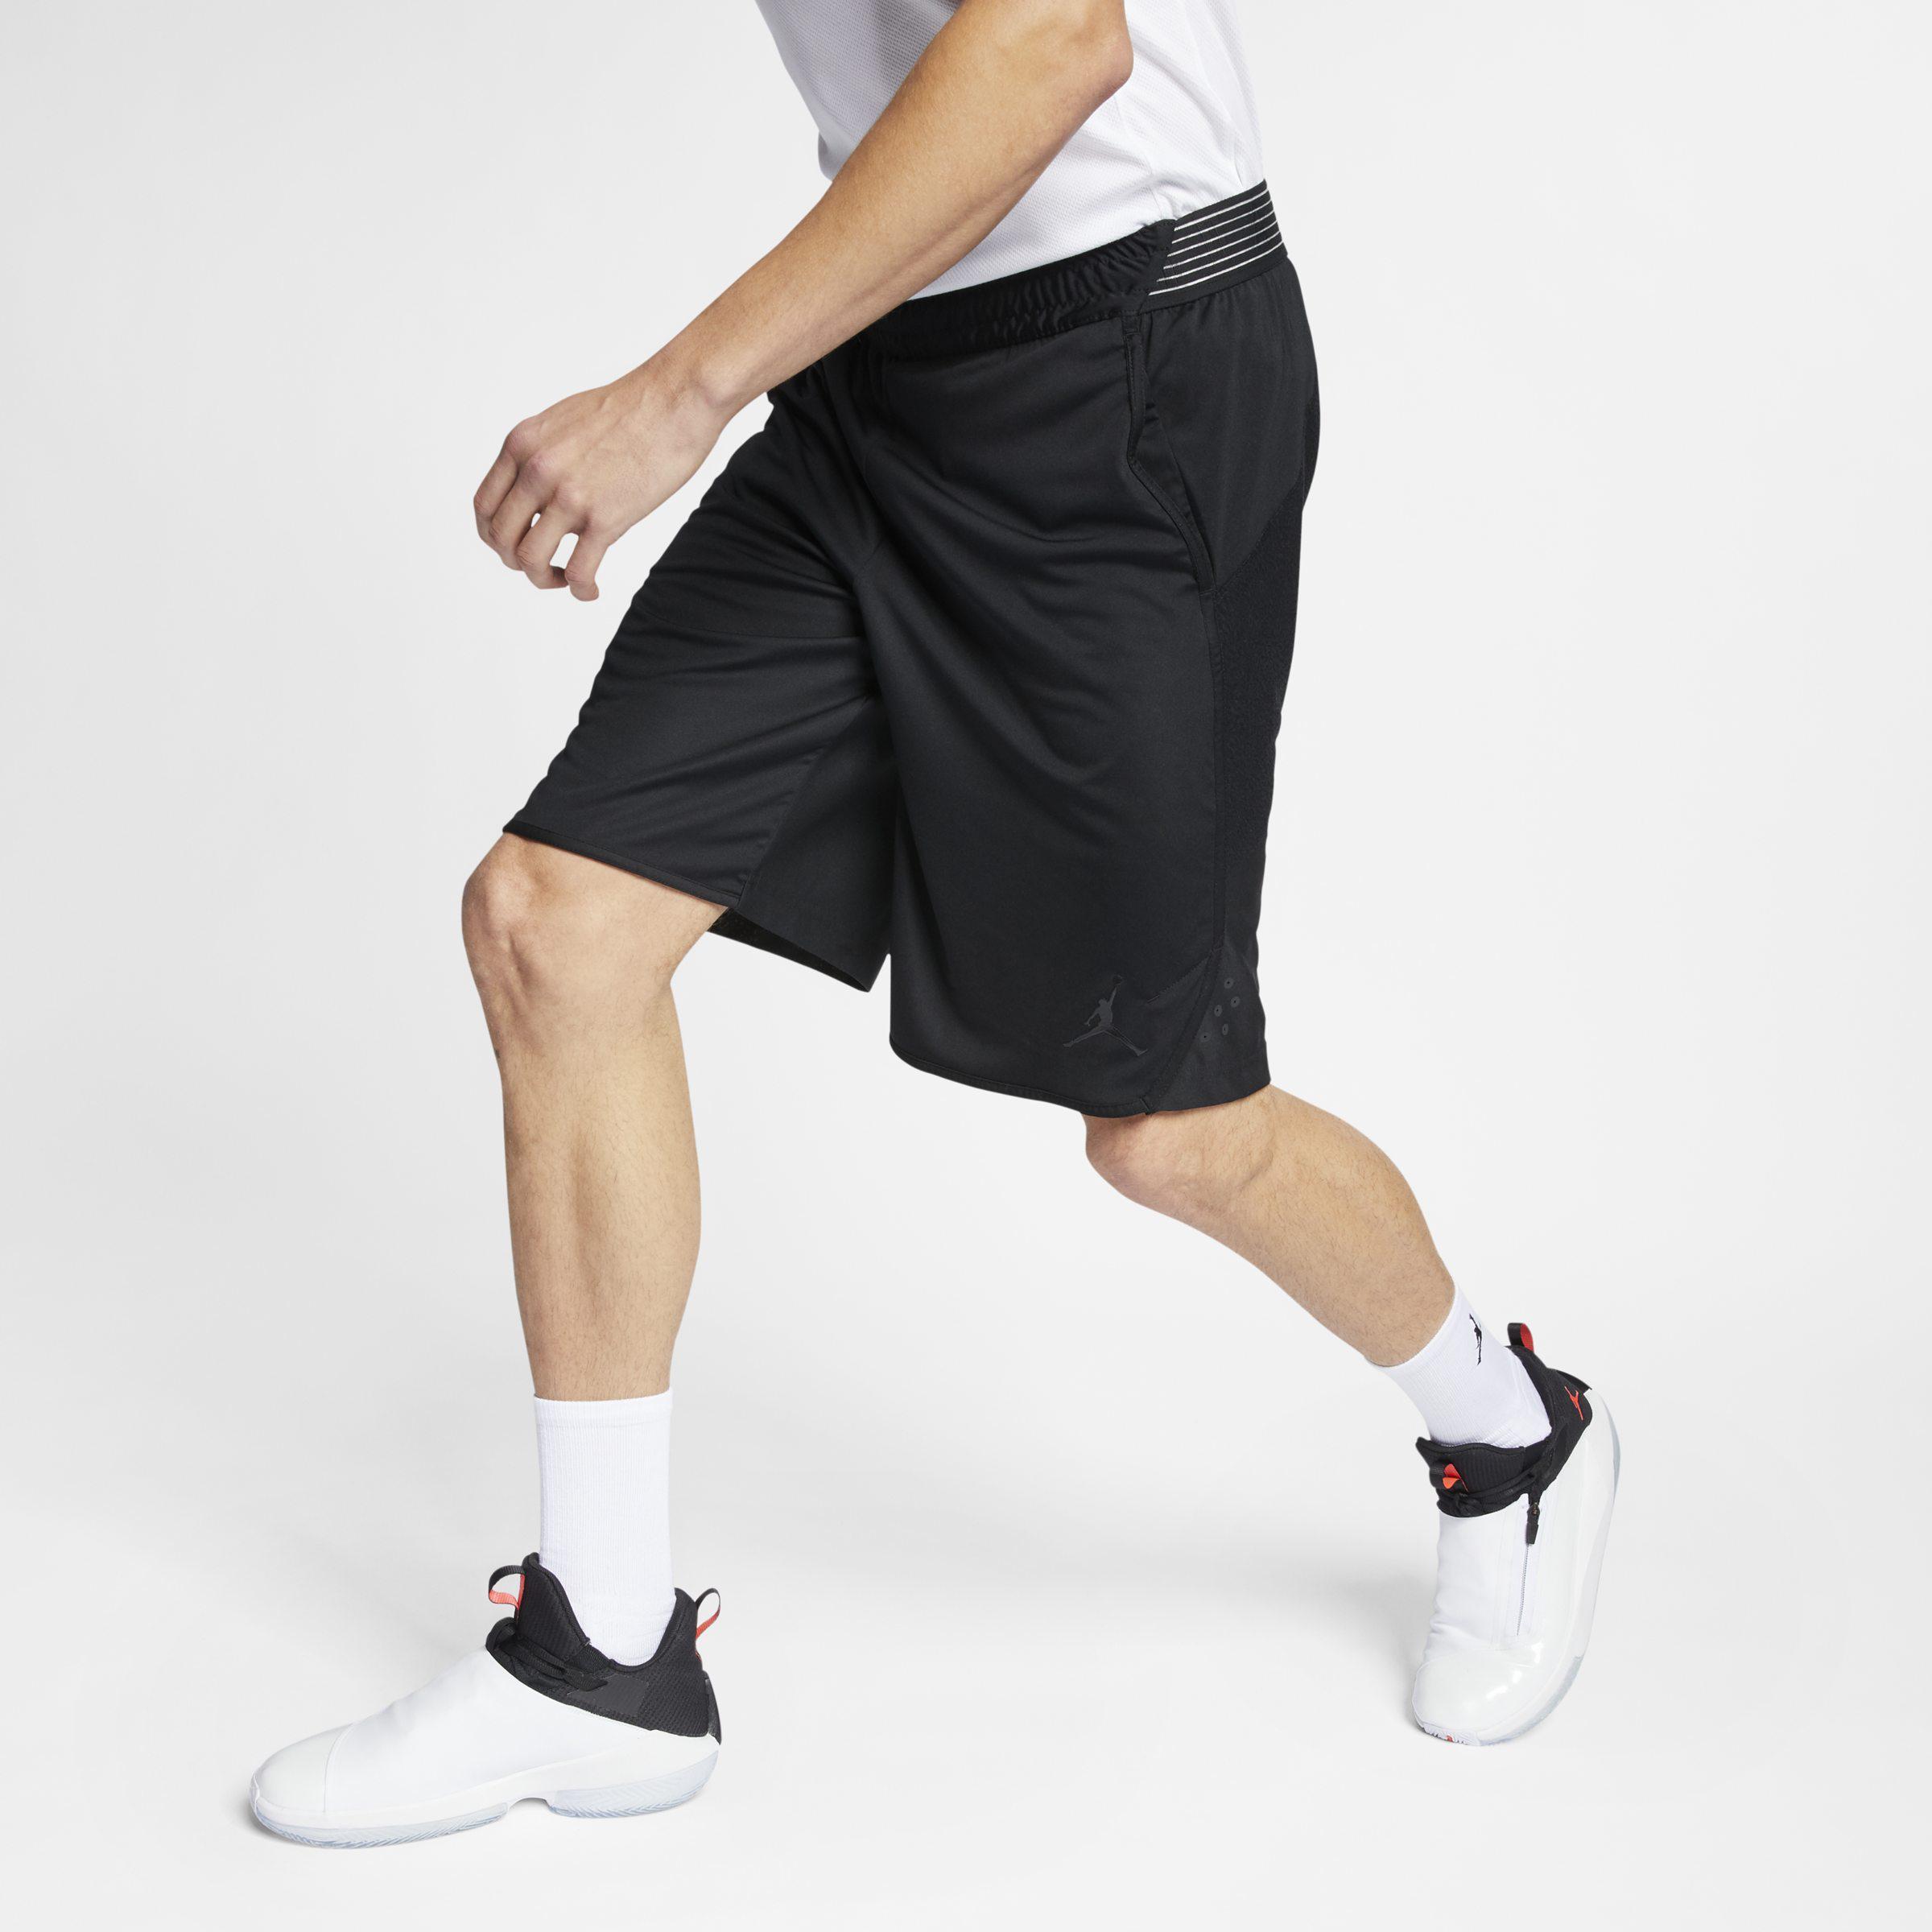 dcca55f376ff1 Nike Black Jordan Ultimate Flight Practice Basketball Shorts for men